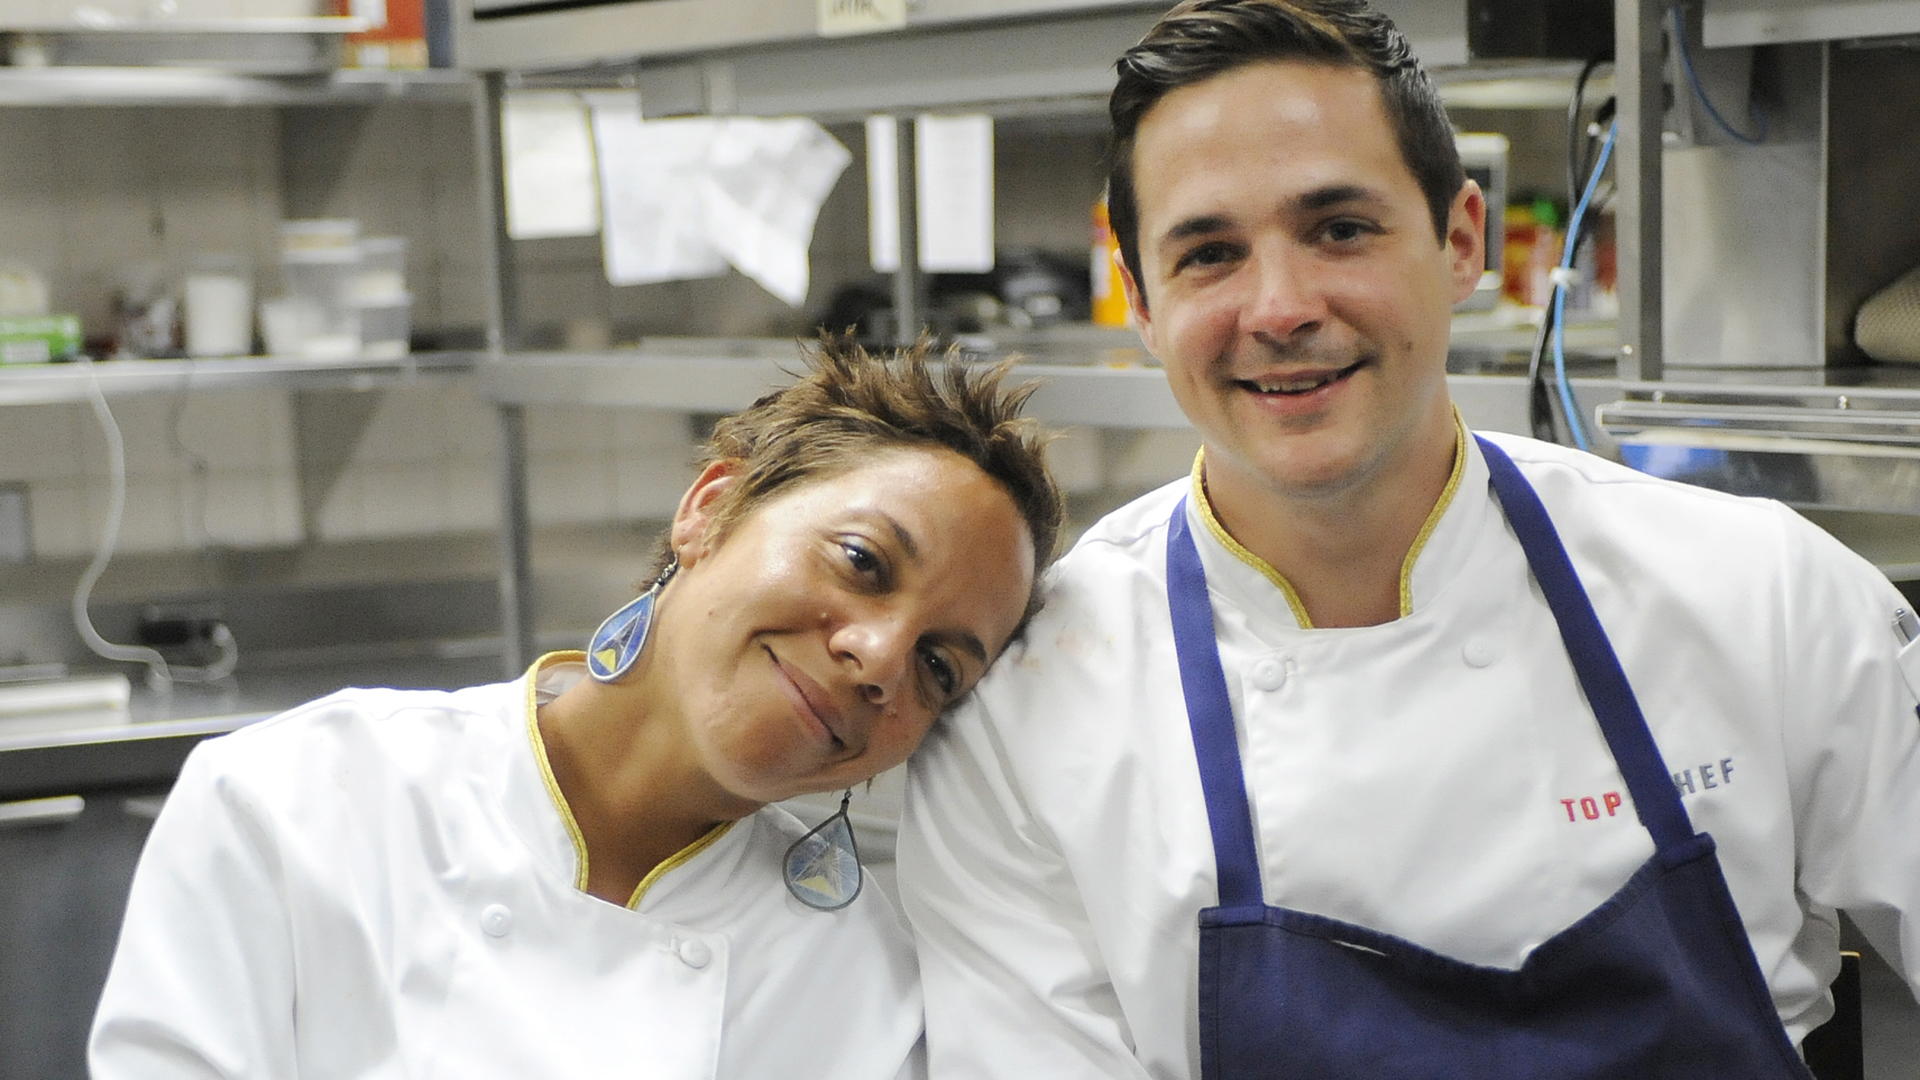 Top Chef: 'Top Chef' Judges Defend Shocking Finale Decision